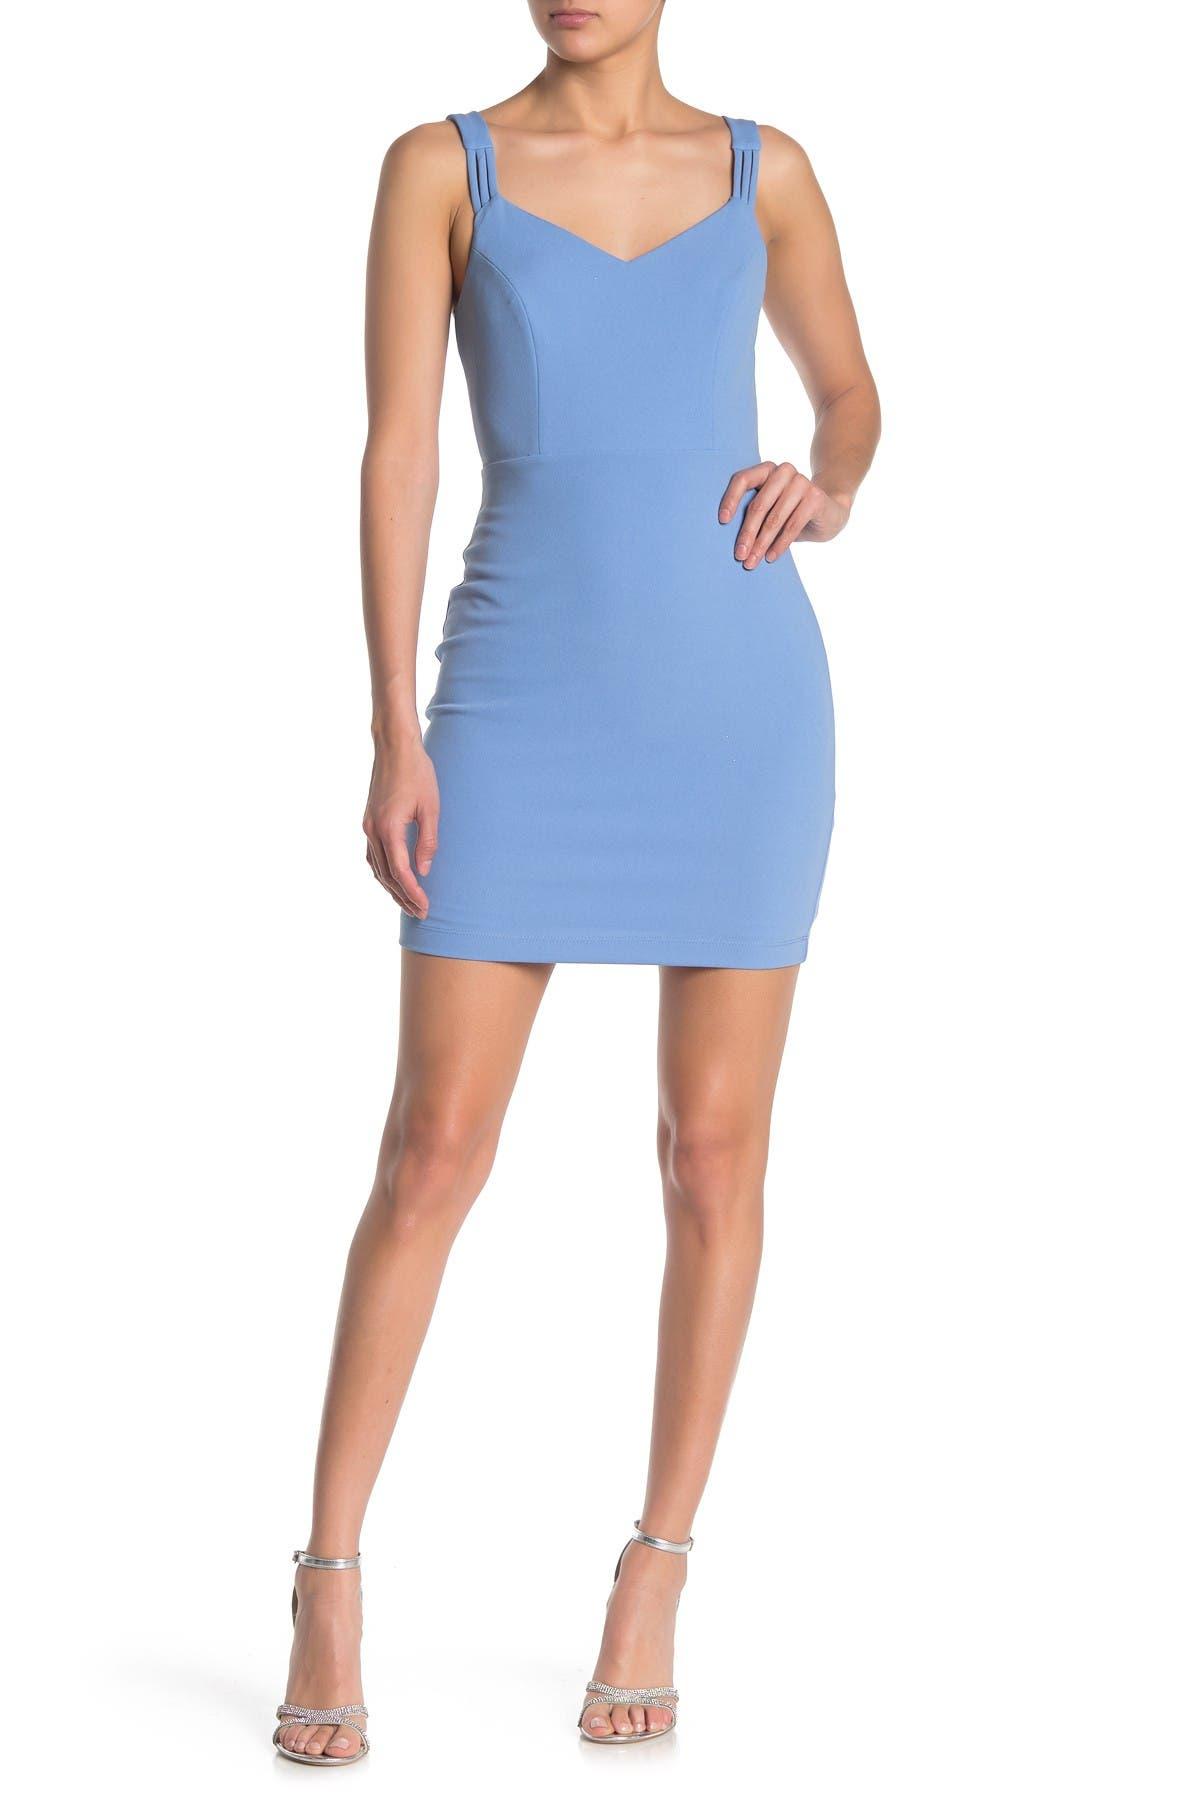 Image of JUMP Scuba Crepe Dress